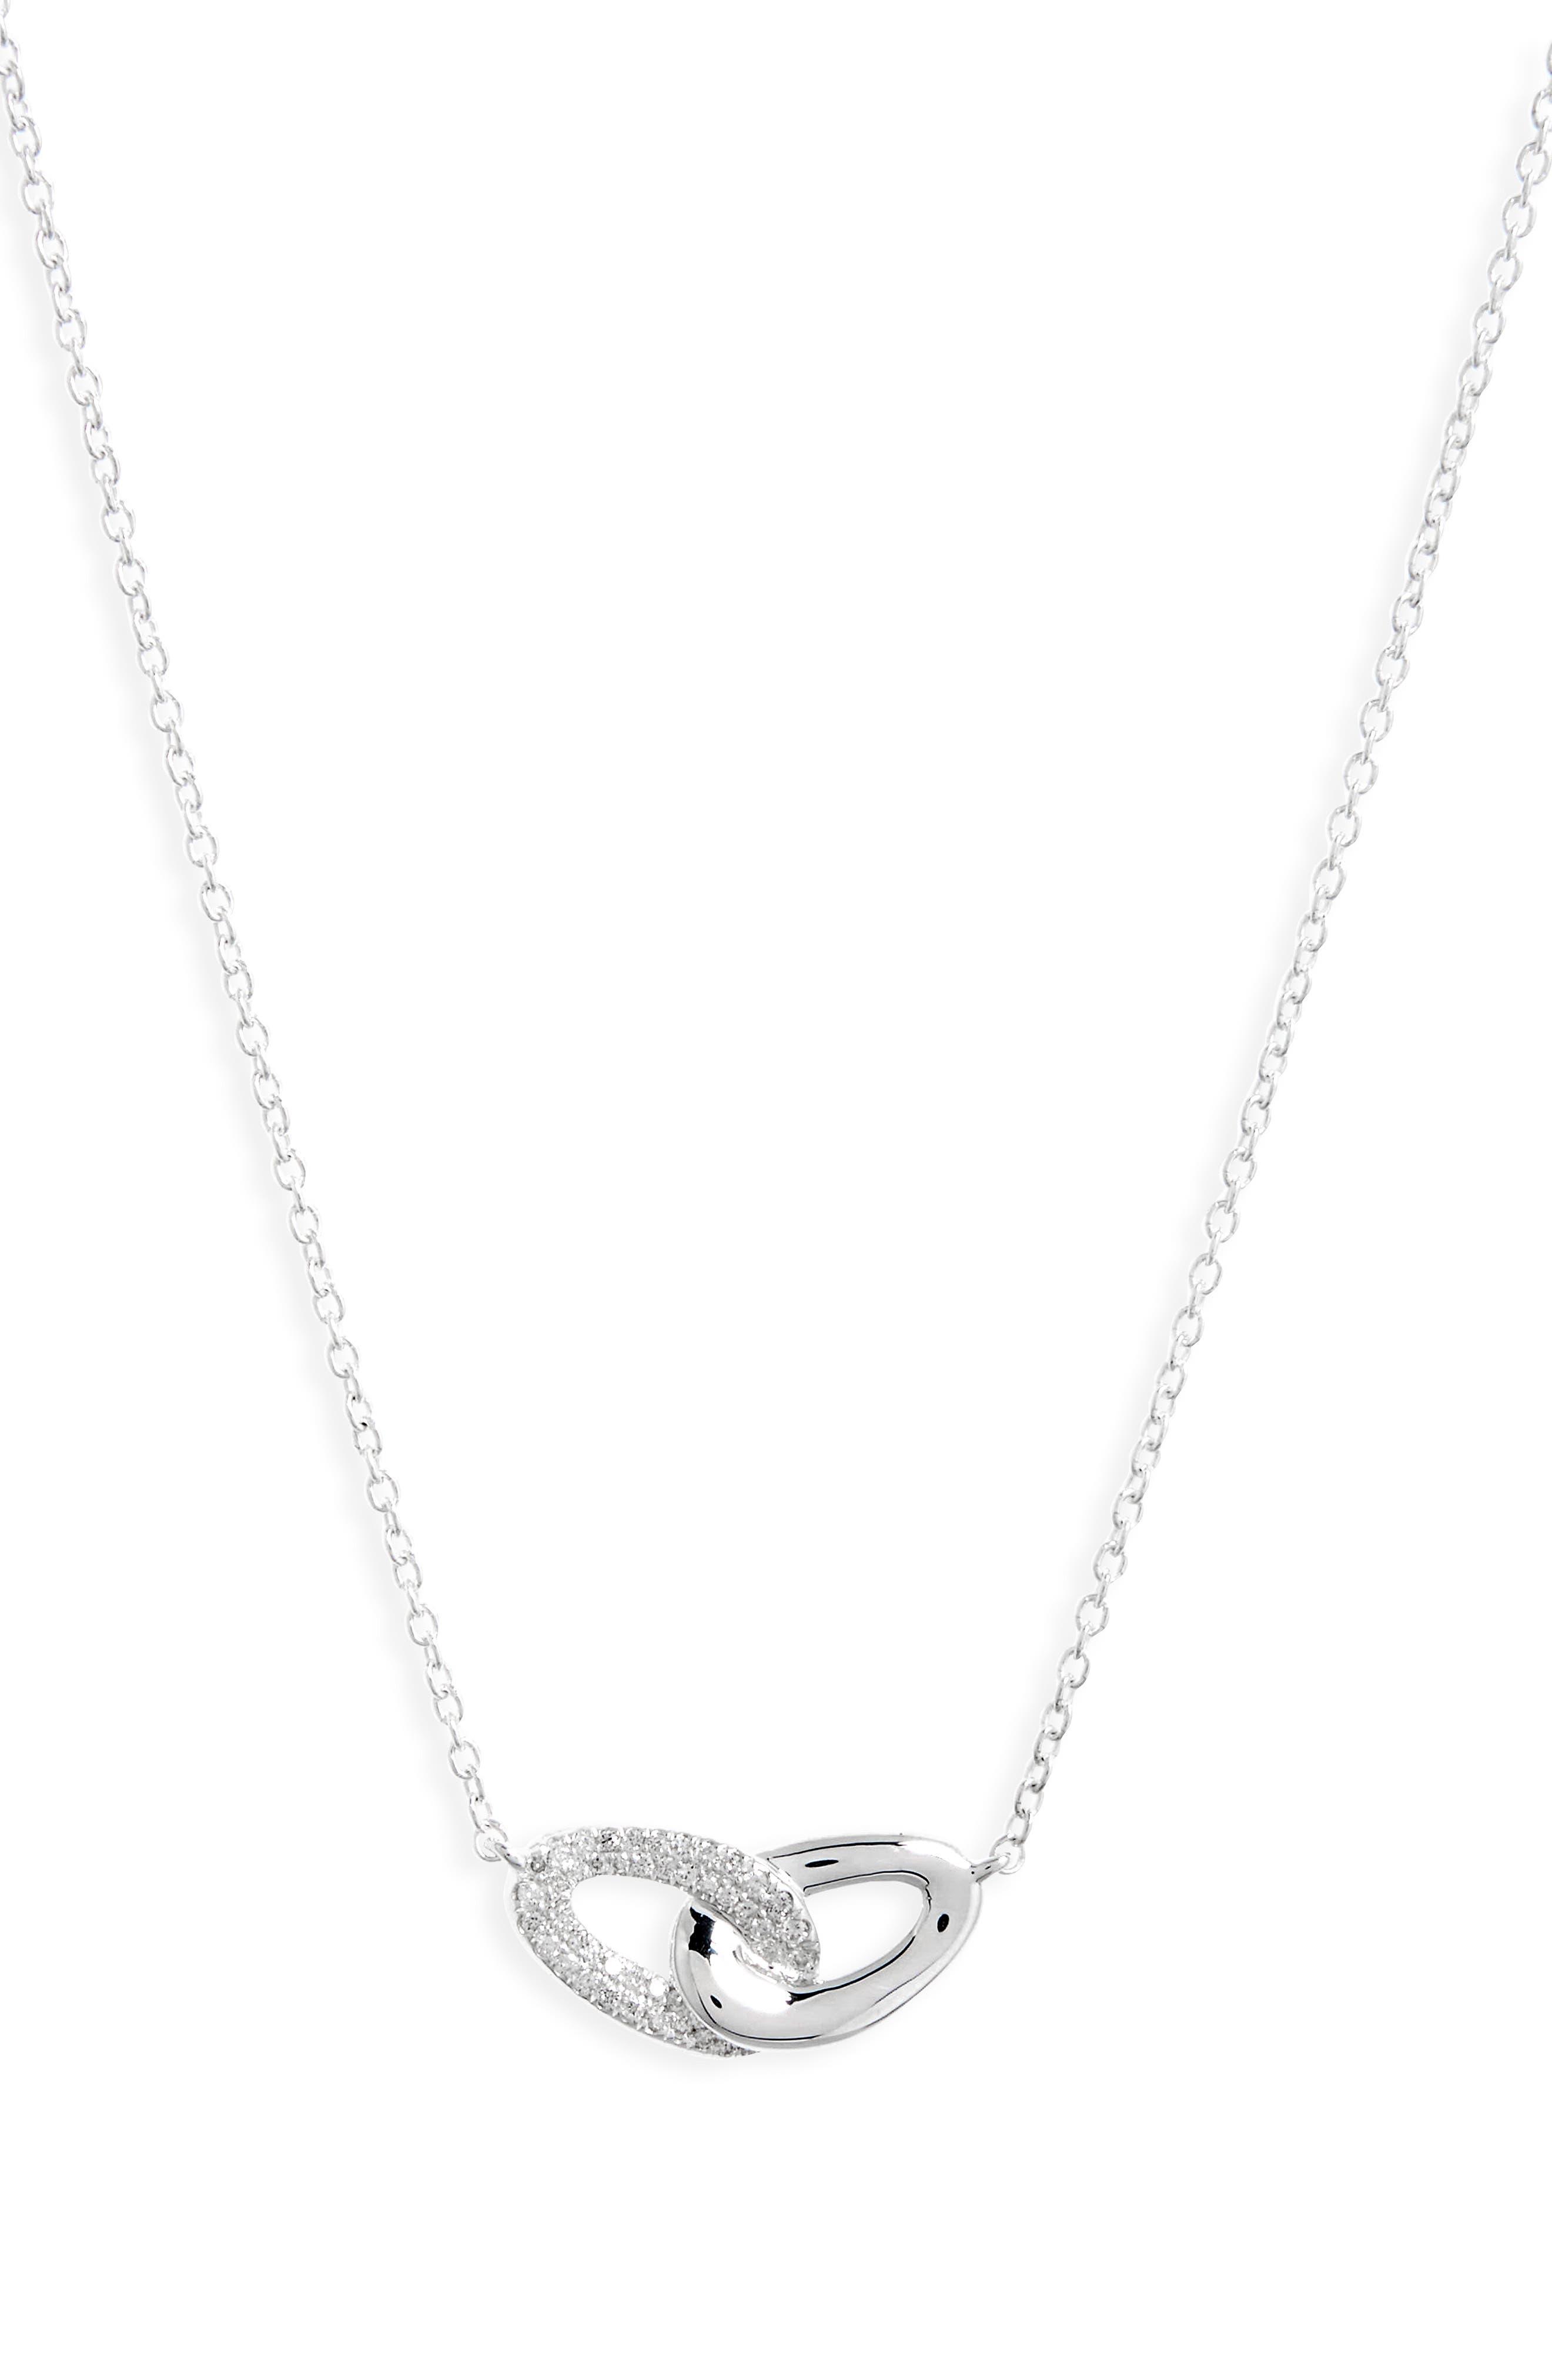 Cherish Interlocking Pendant Necklace,                         Main,                         color, SILVER